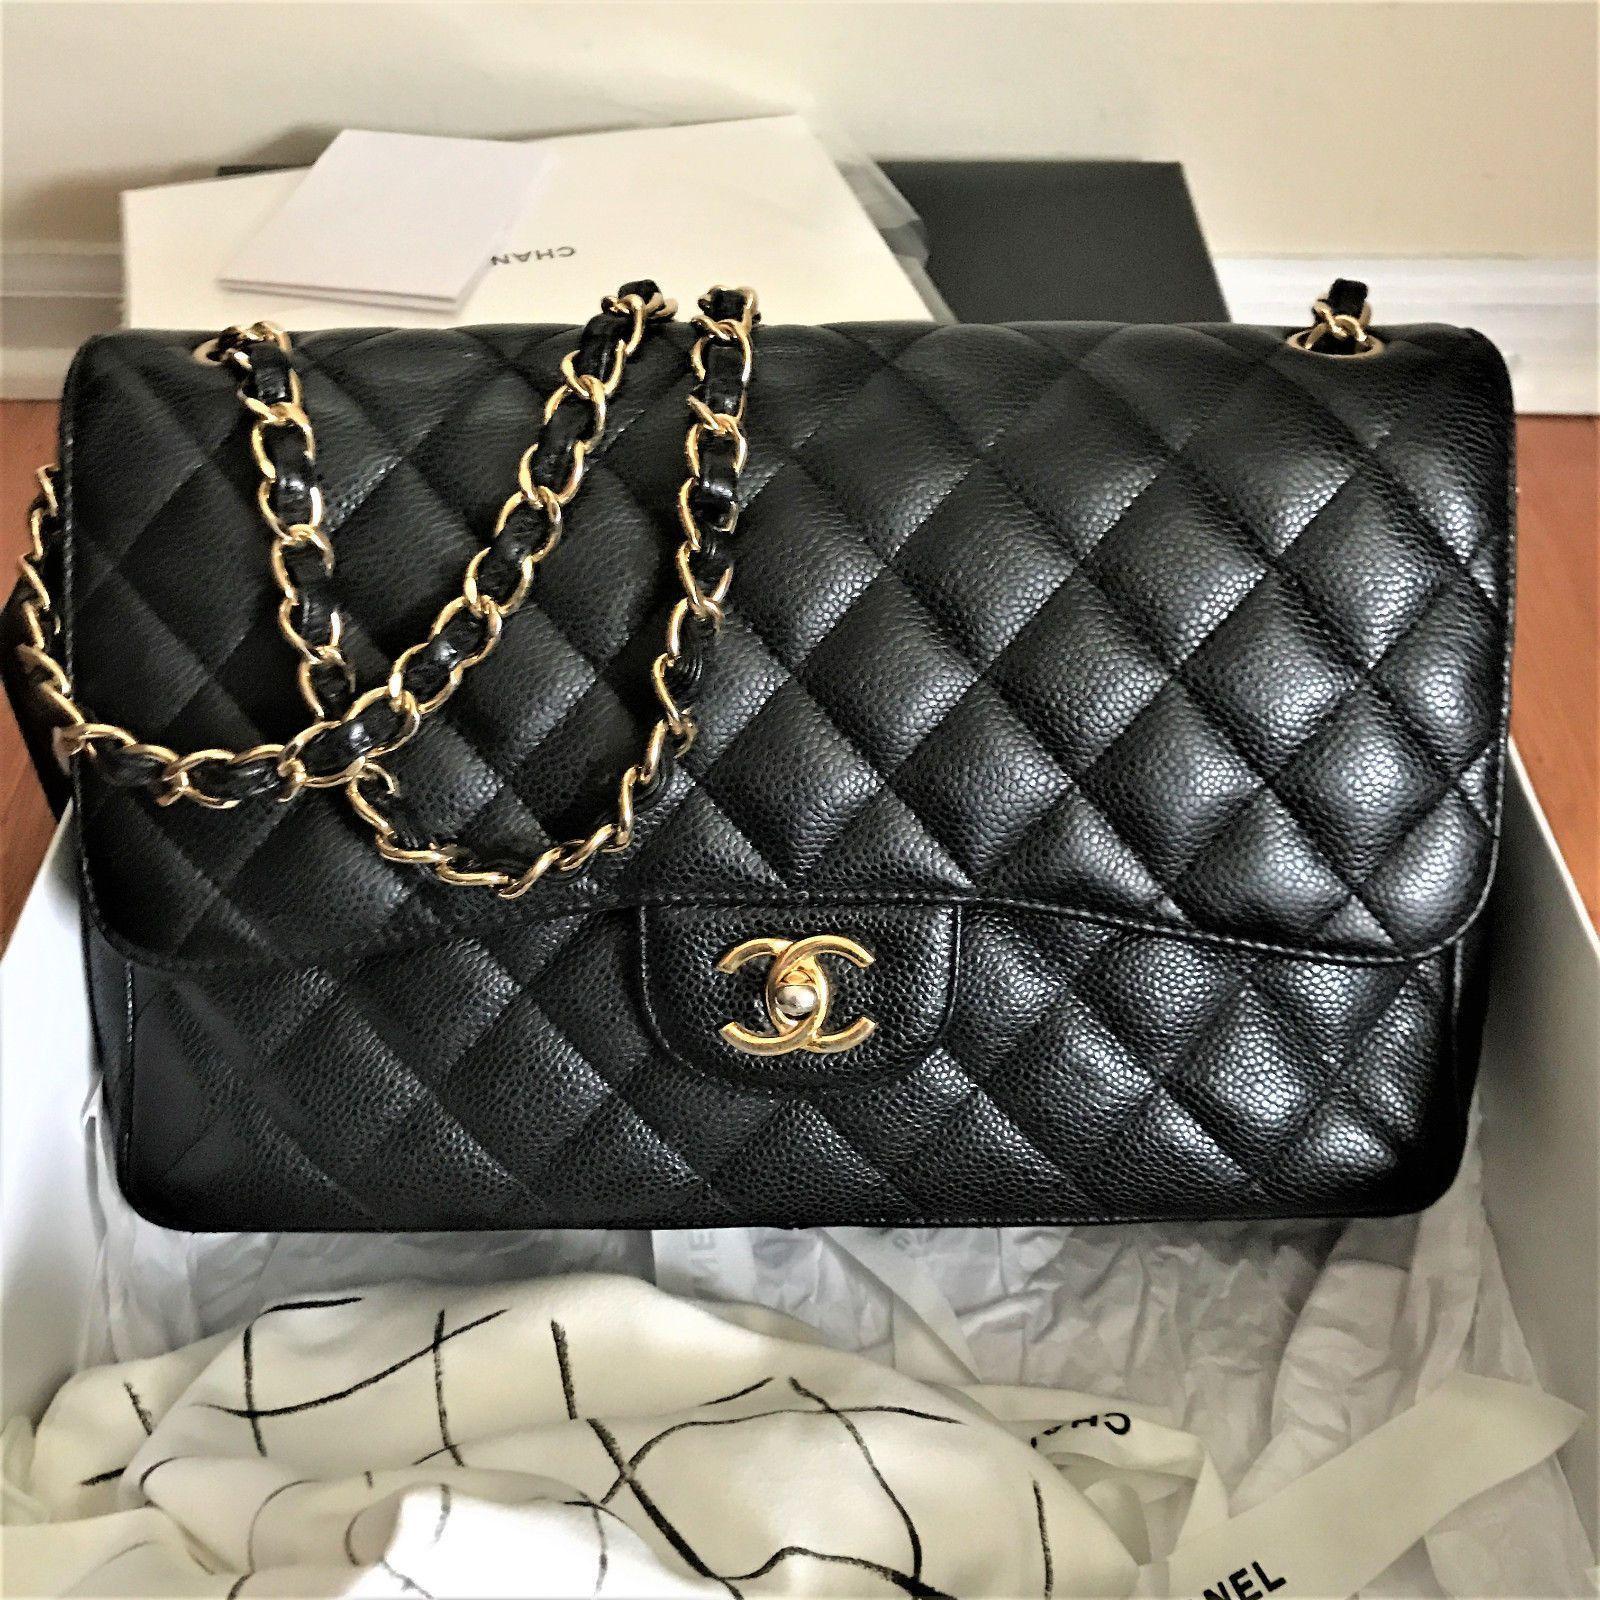 6417979437e4 Authentic Chanel Black Caviar Jumbo Classic 2.55 Double Flap Bag Gold HW  #Chanelhandbags